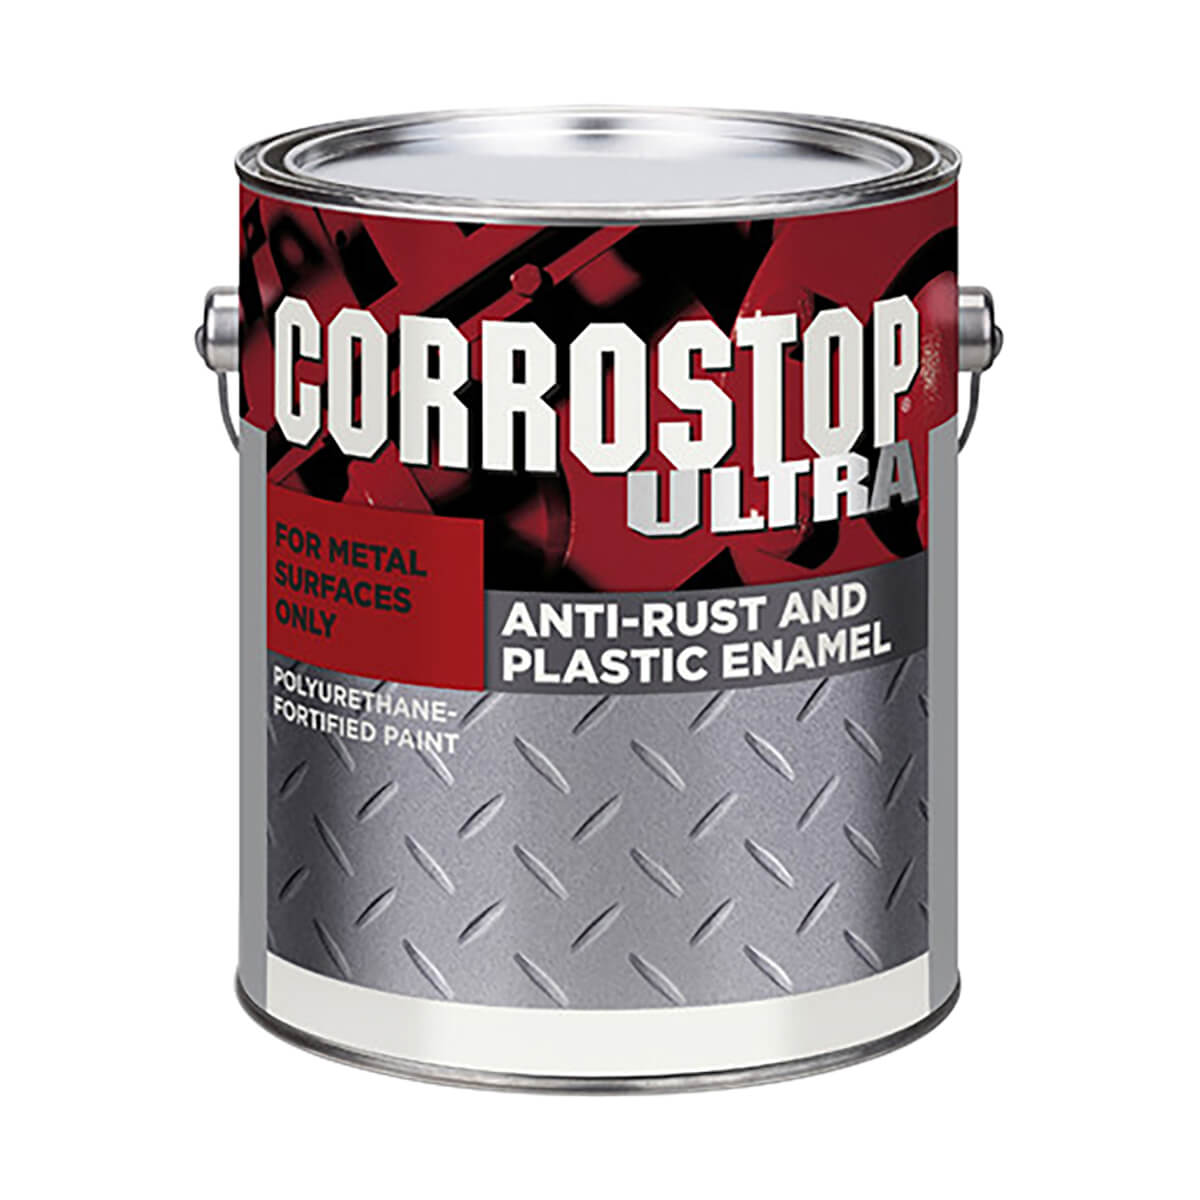 Corrostop - Anti-rust Alkyd Paint - Bright Red - 3.78 L